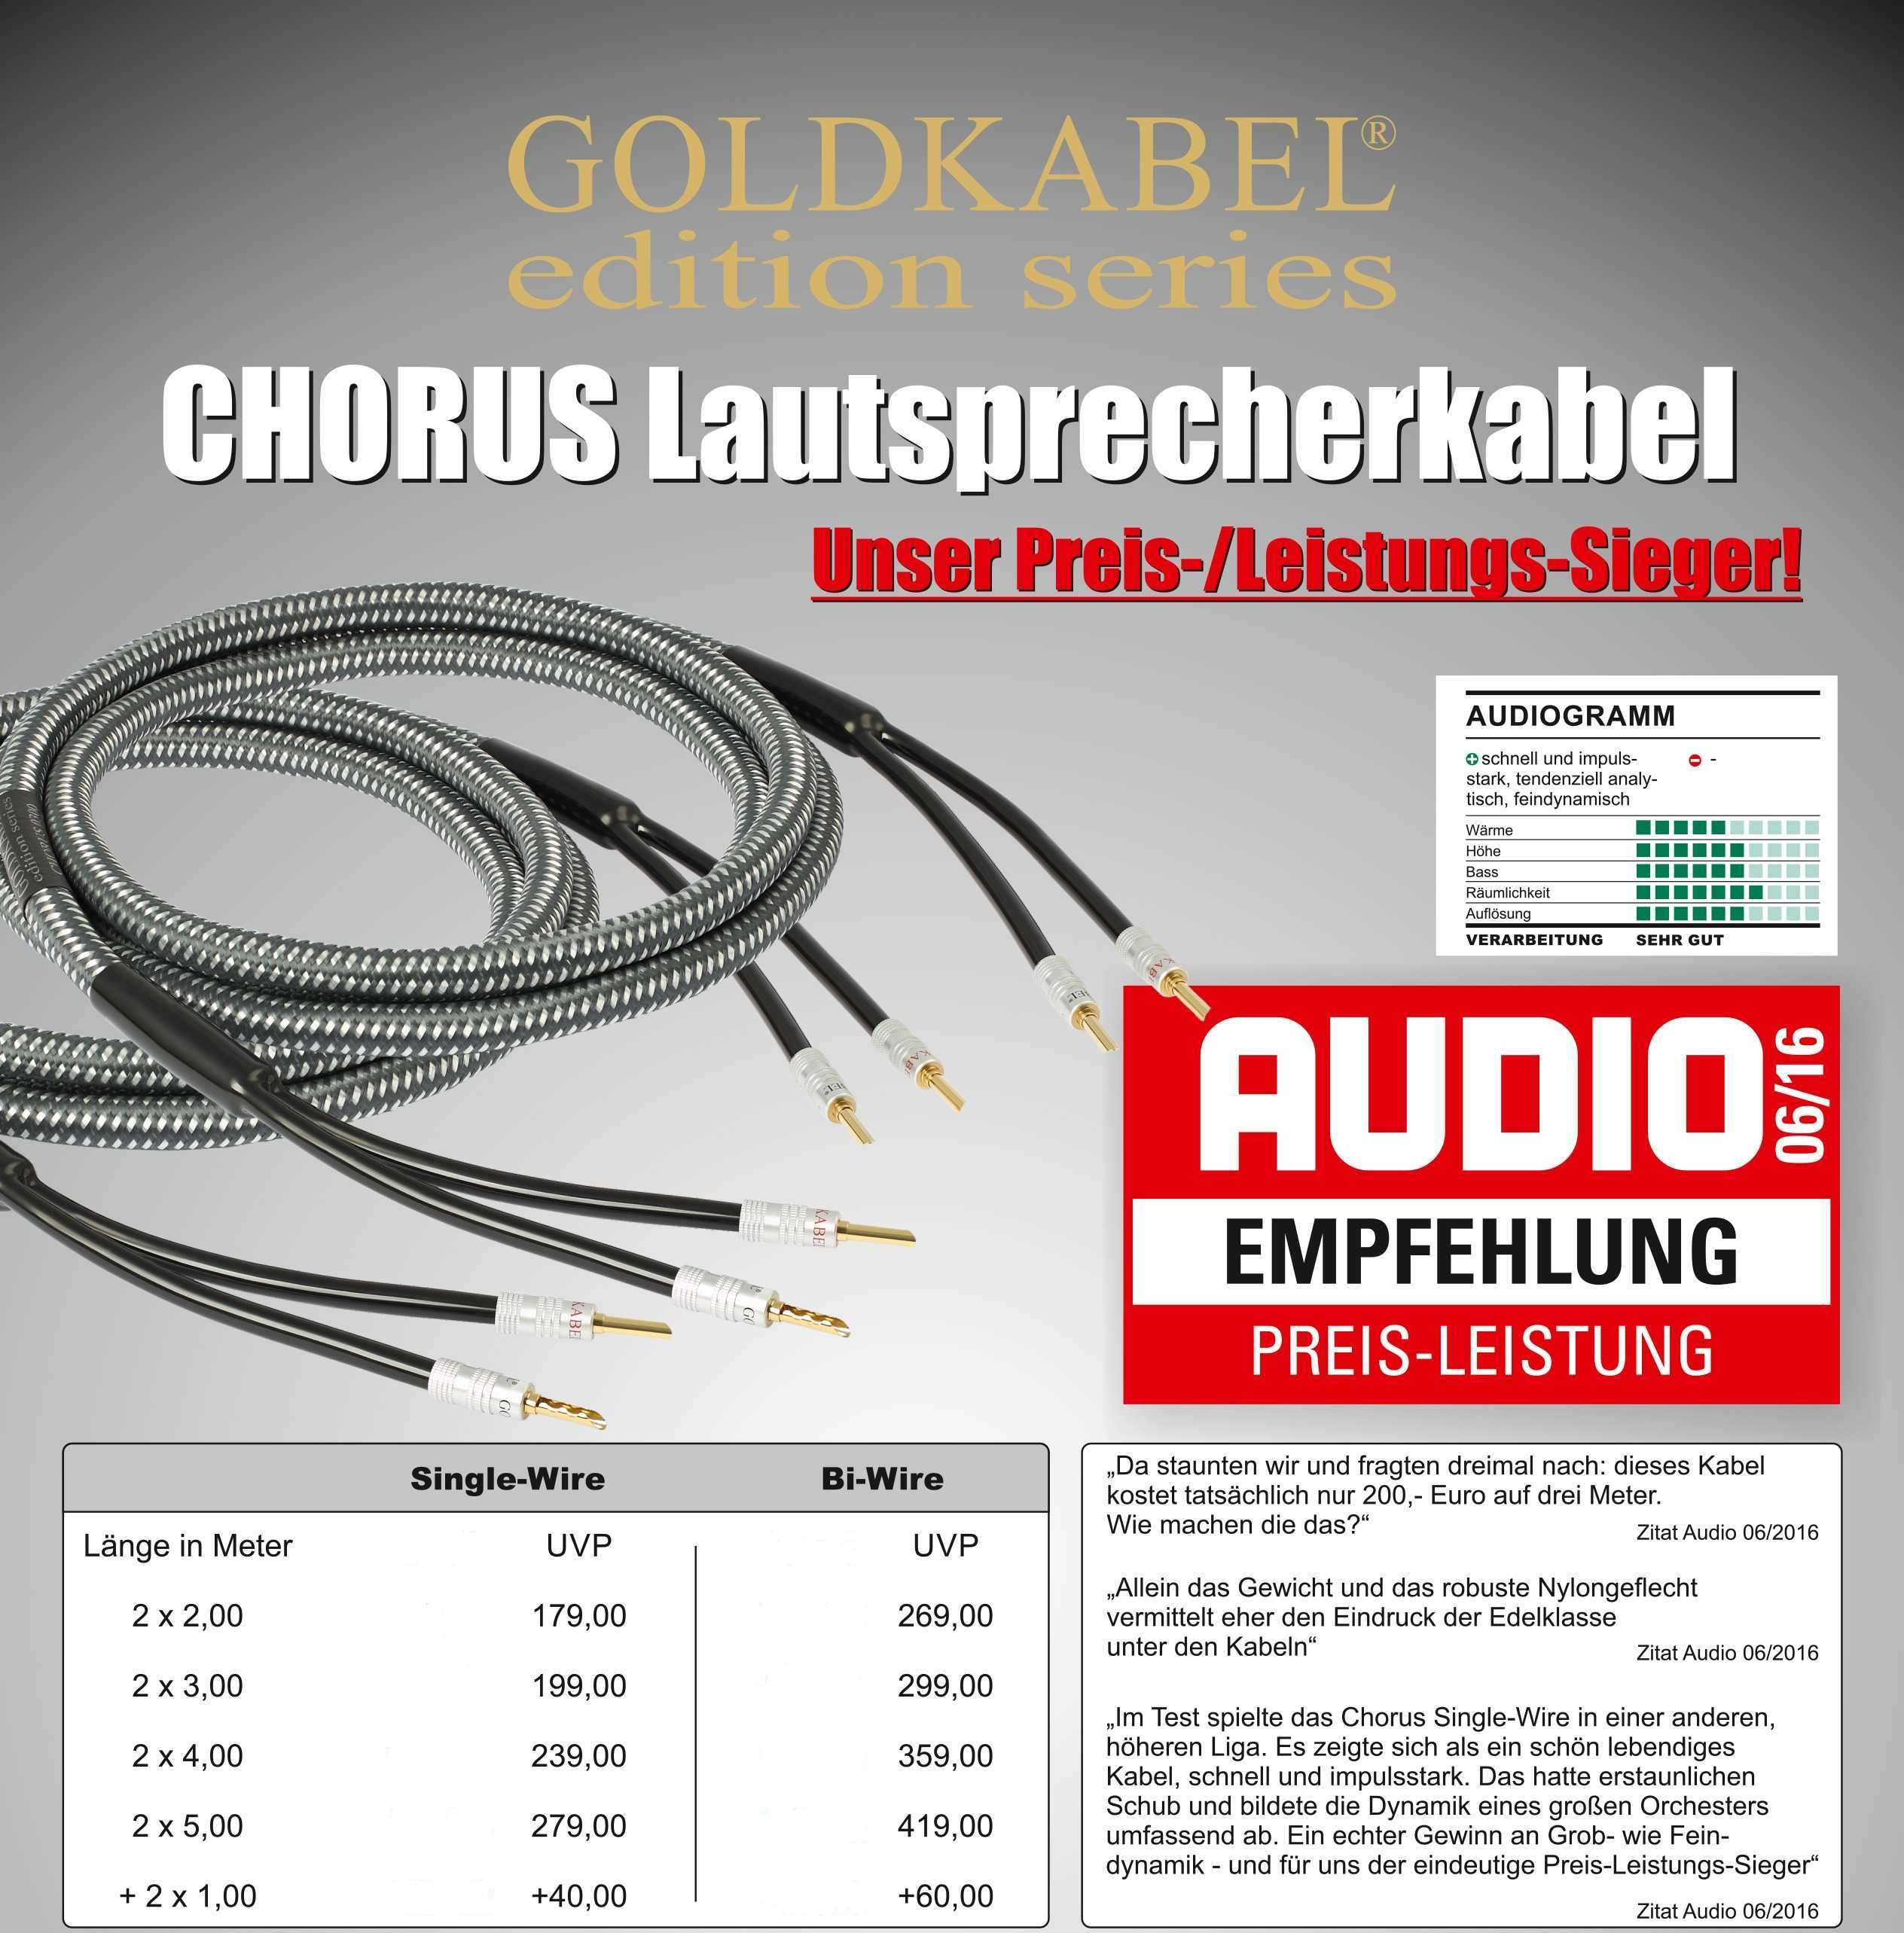 Goldkabel-Chorus.-AUDIO-Preis-Leistungs-Sieger-1